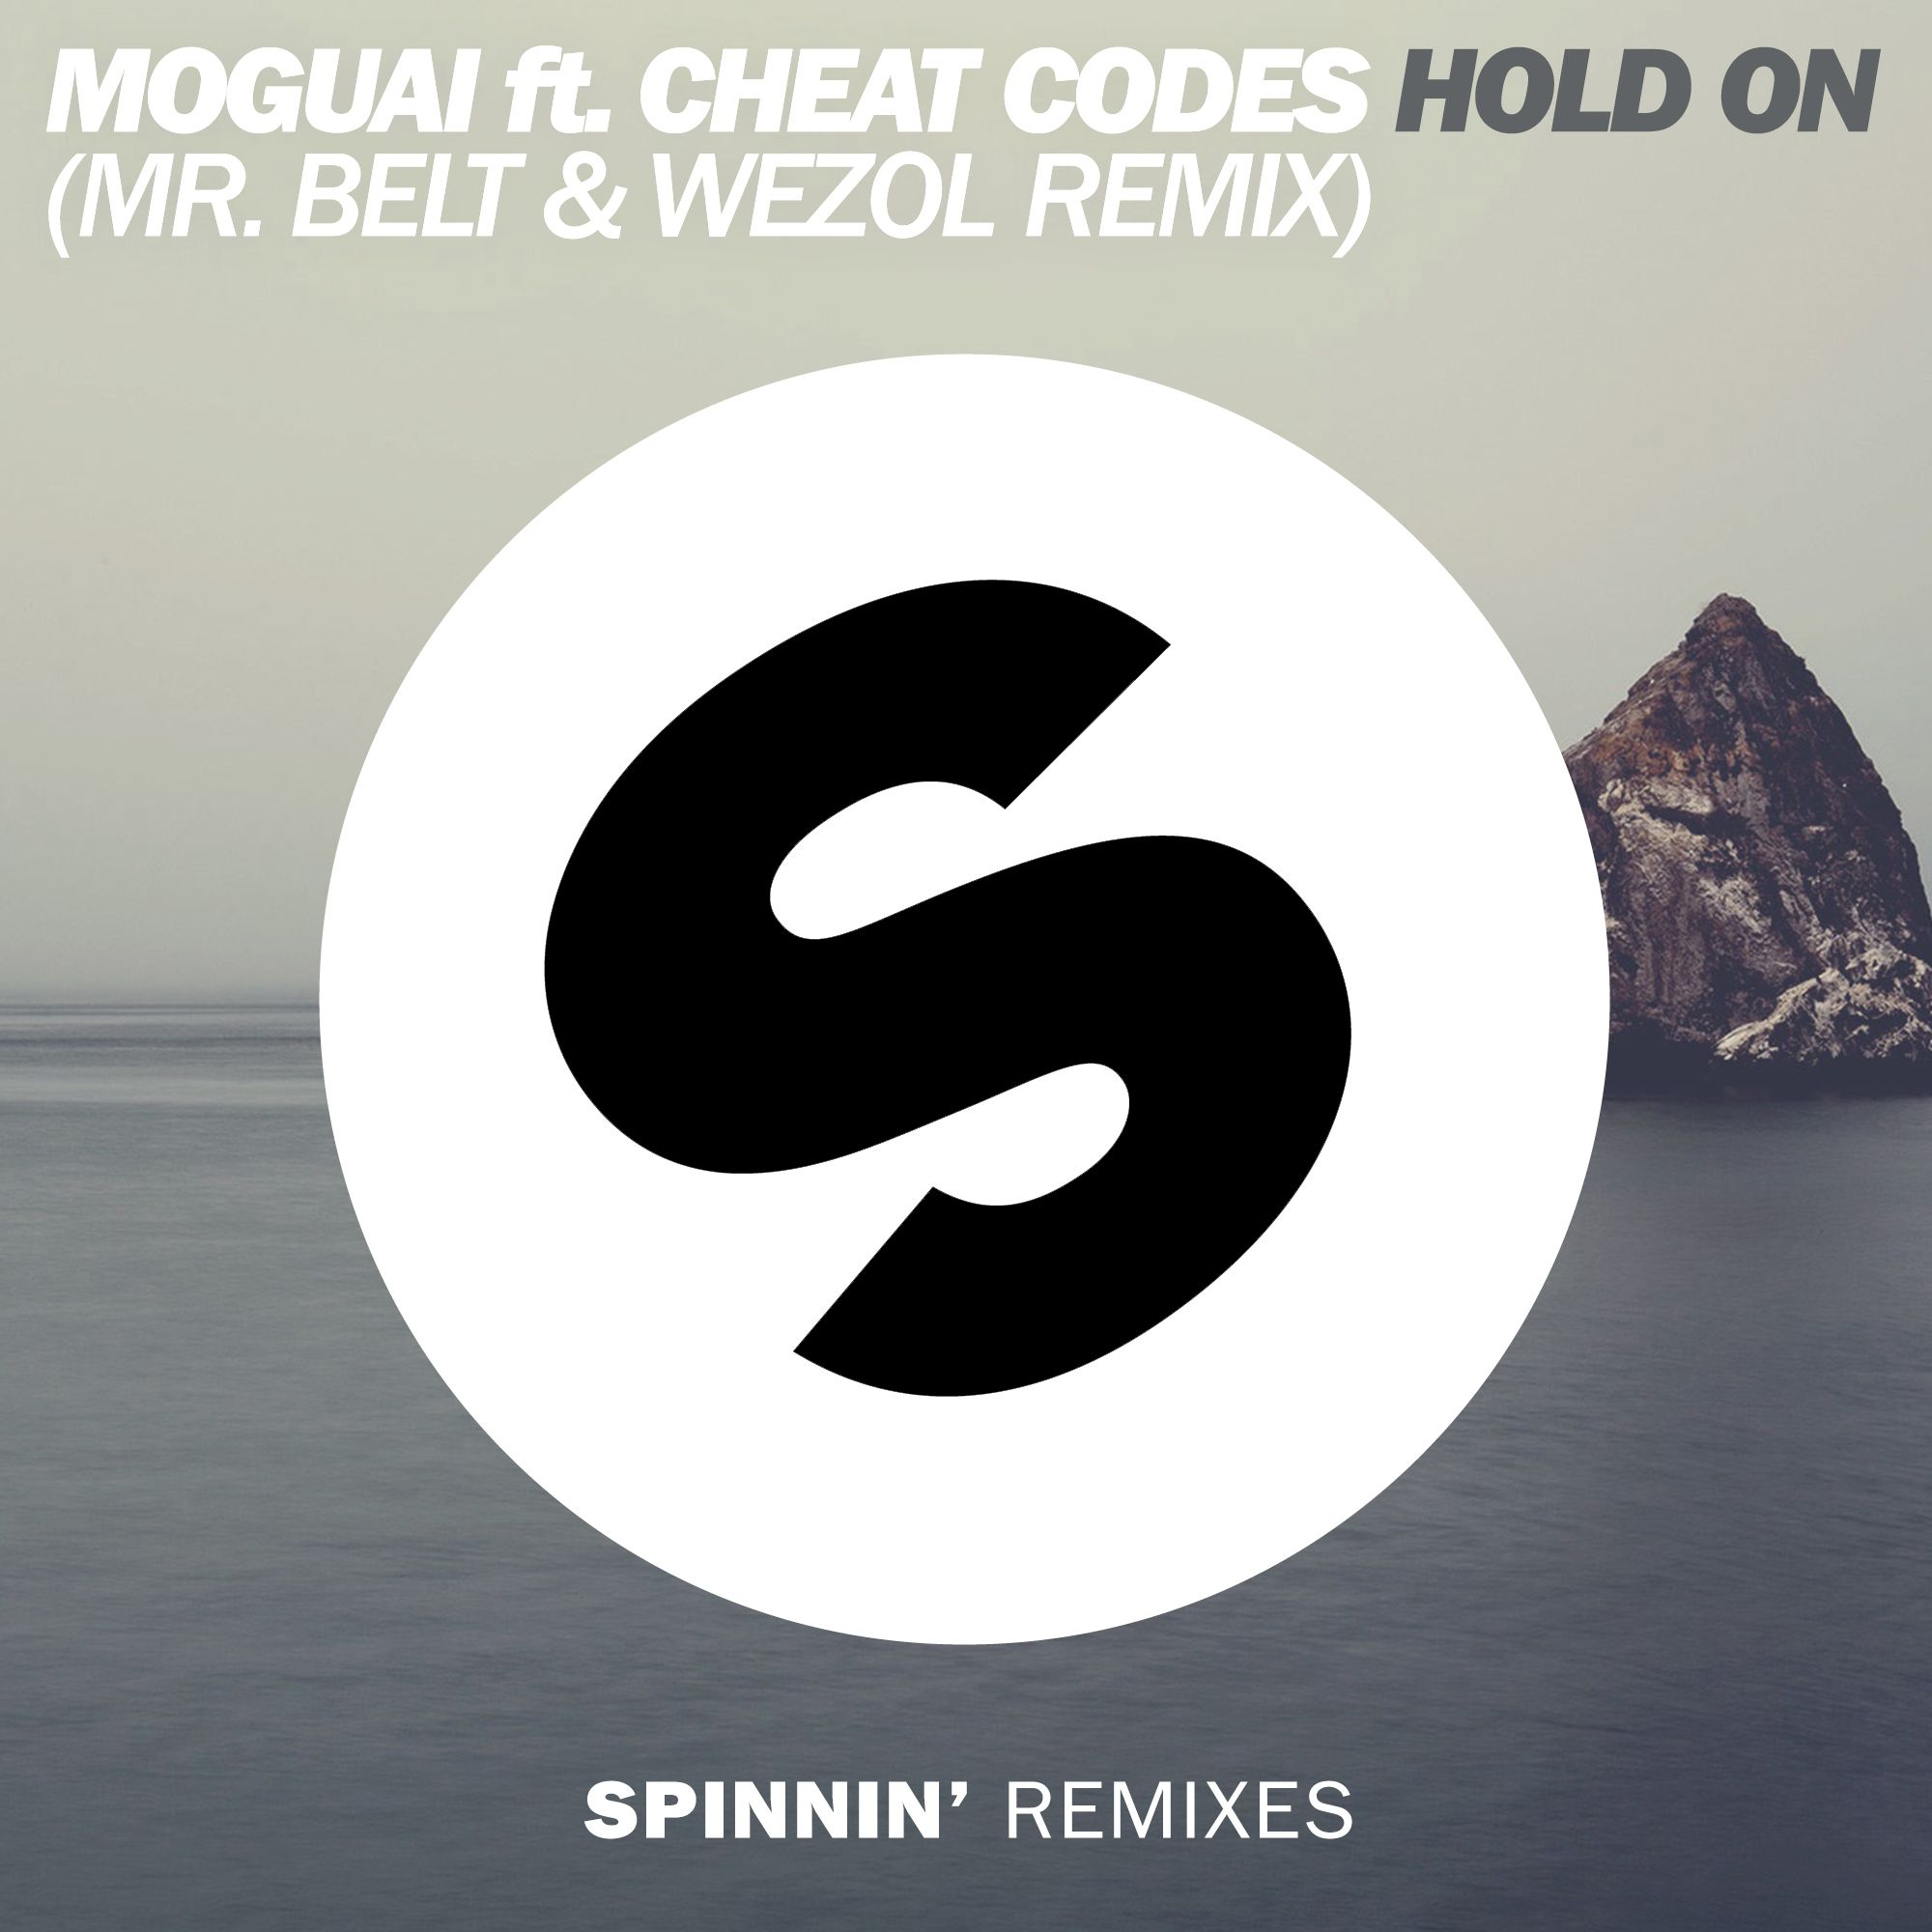 sprmx_moguai_ft_cheat_codes_-_hold_on_mr._belt_wezol_remix.jpg